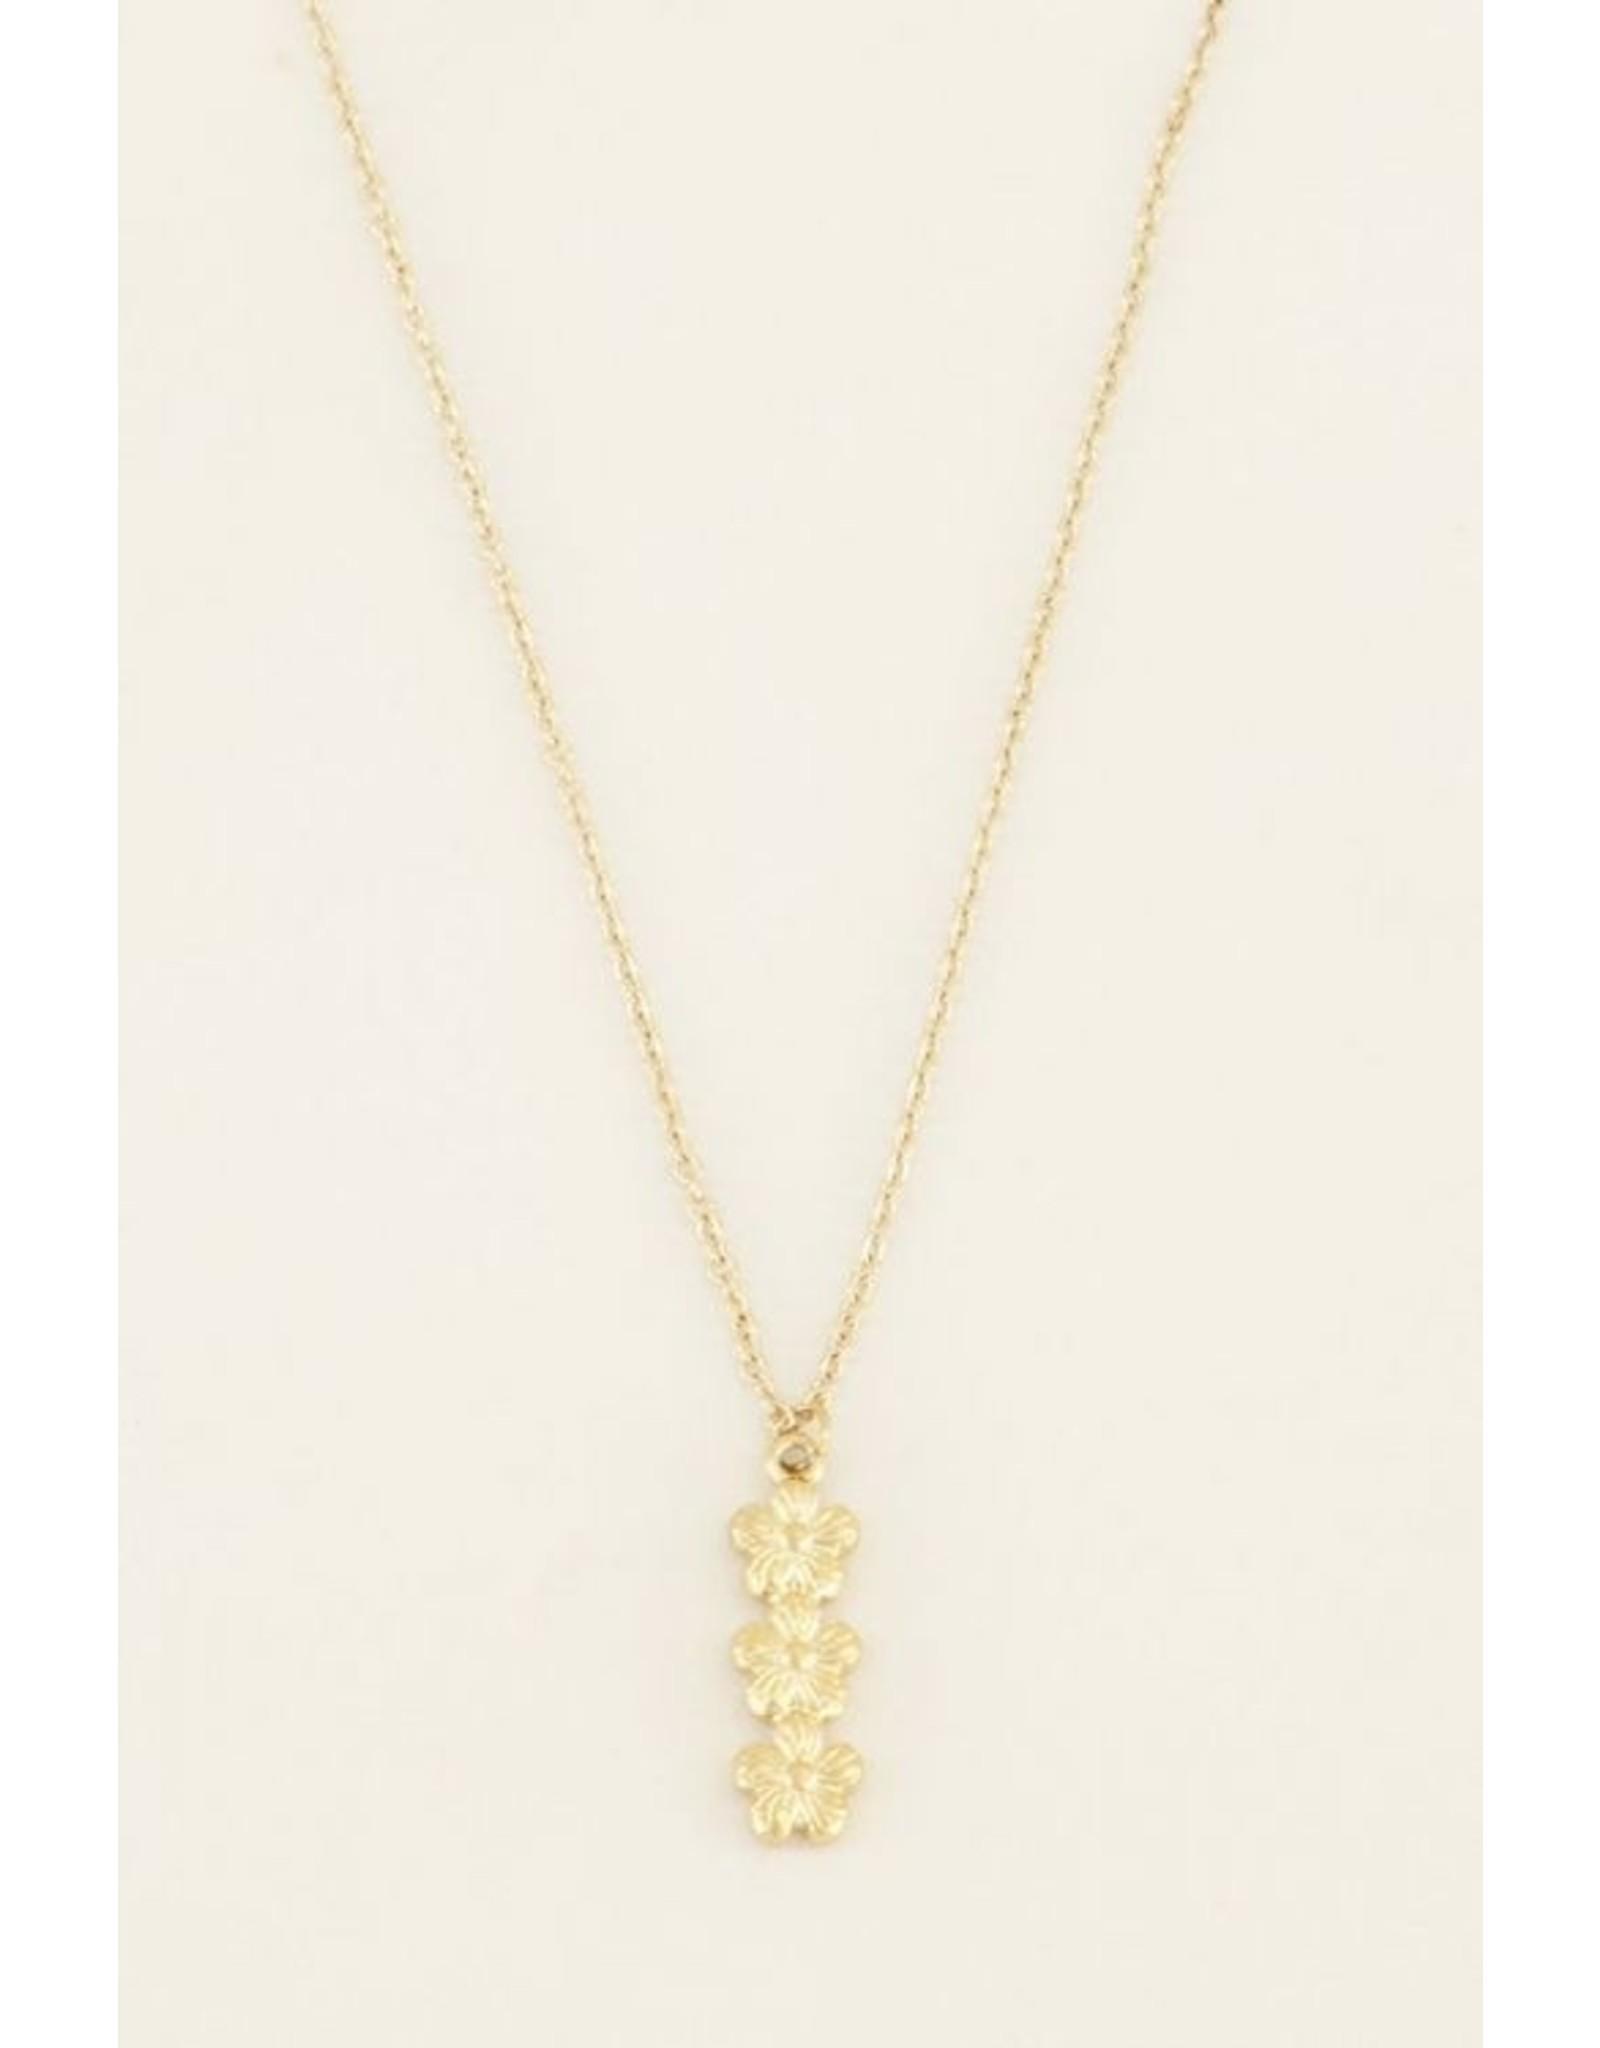 My Jewellery Ketting drie bloemetjes goud  135011